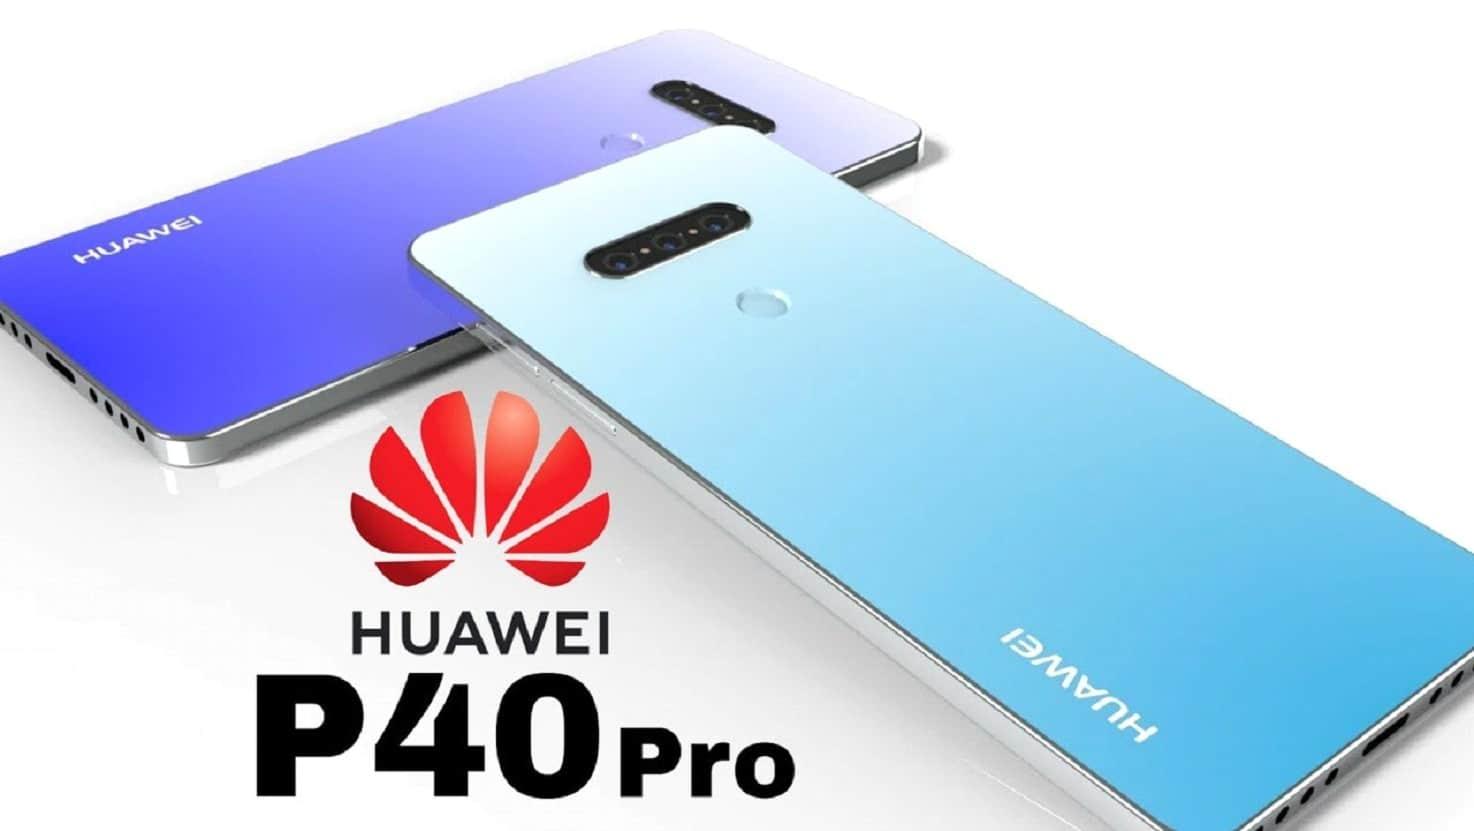 huawai p40 pro